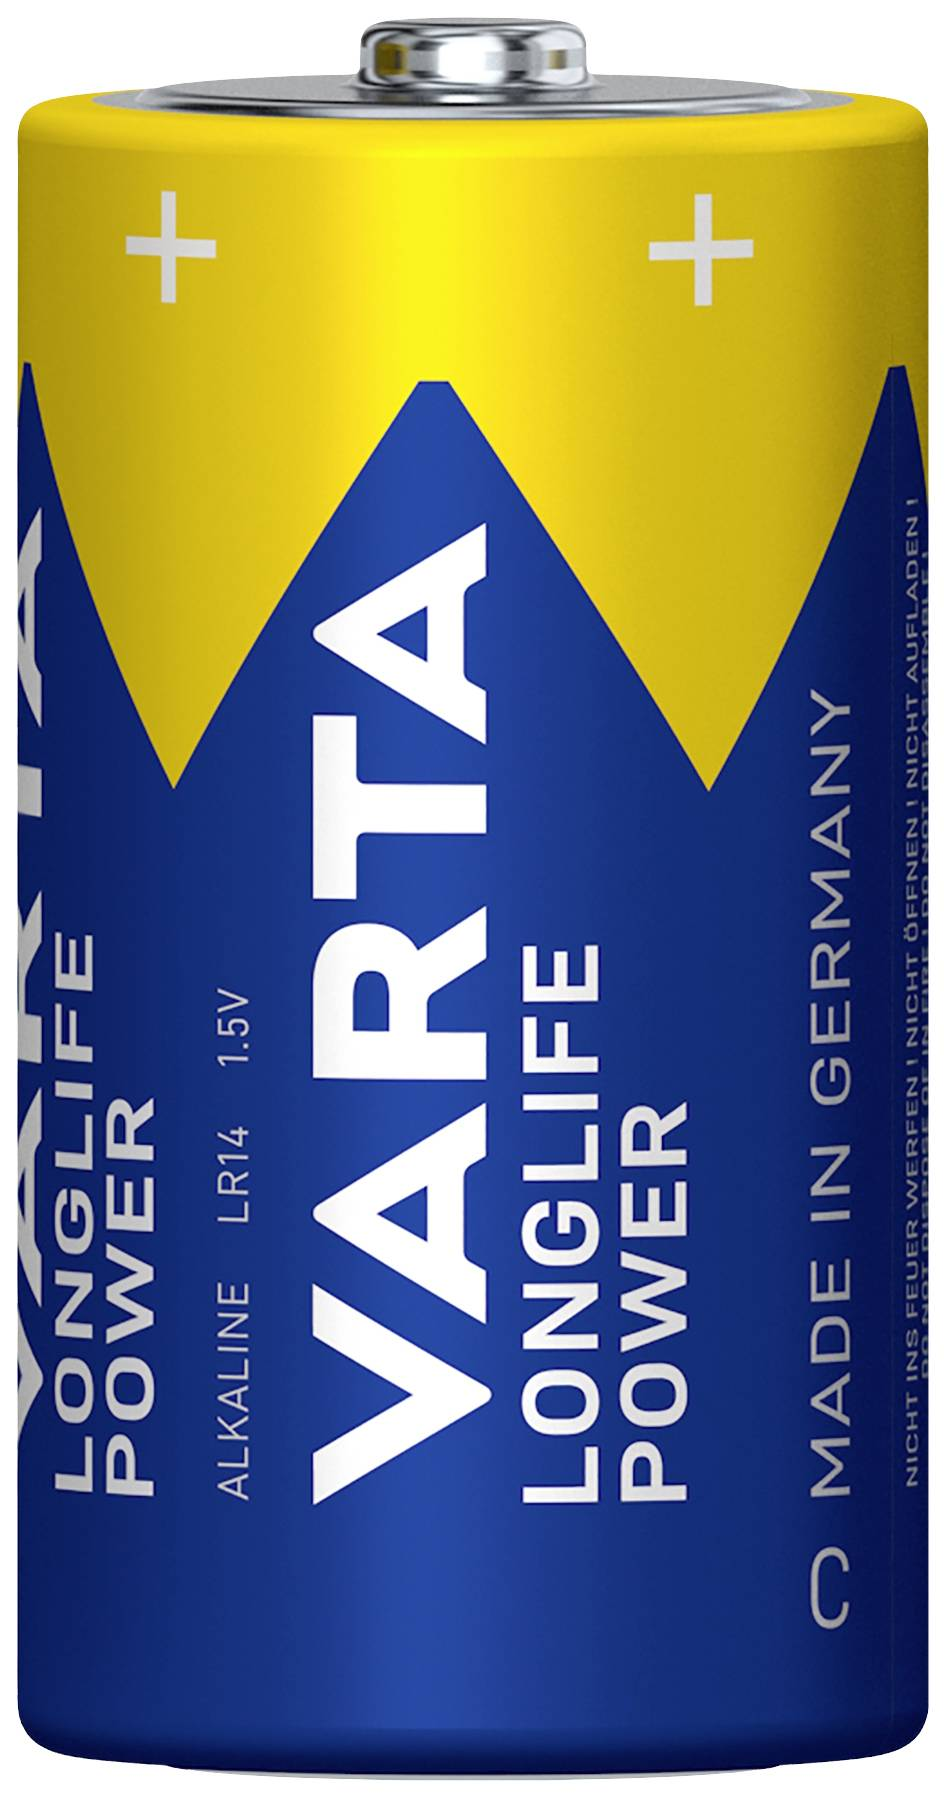 Batéria VARTA High Energy 2 ks, malé mono, 1,5 V